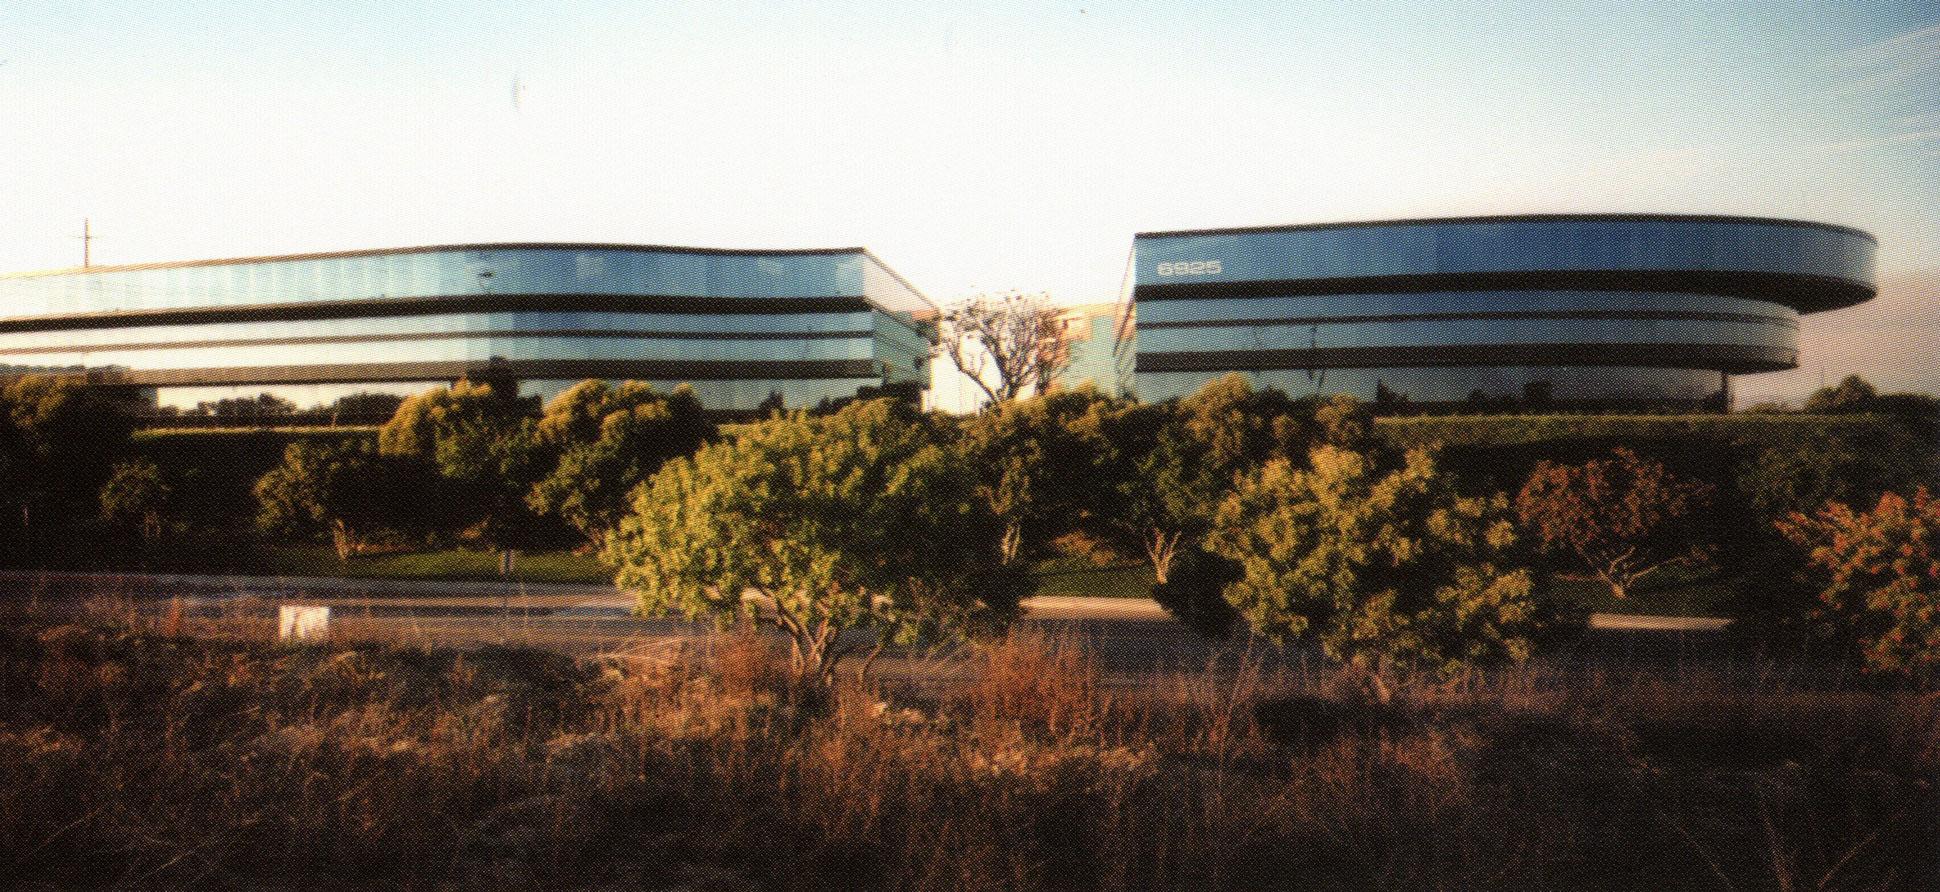 Wateridge_Corporate_Center.jpg